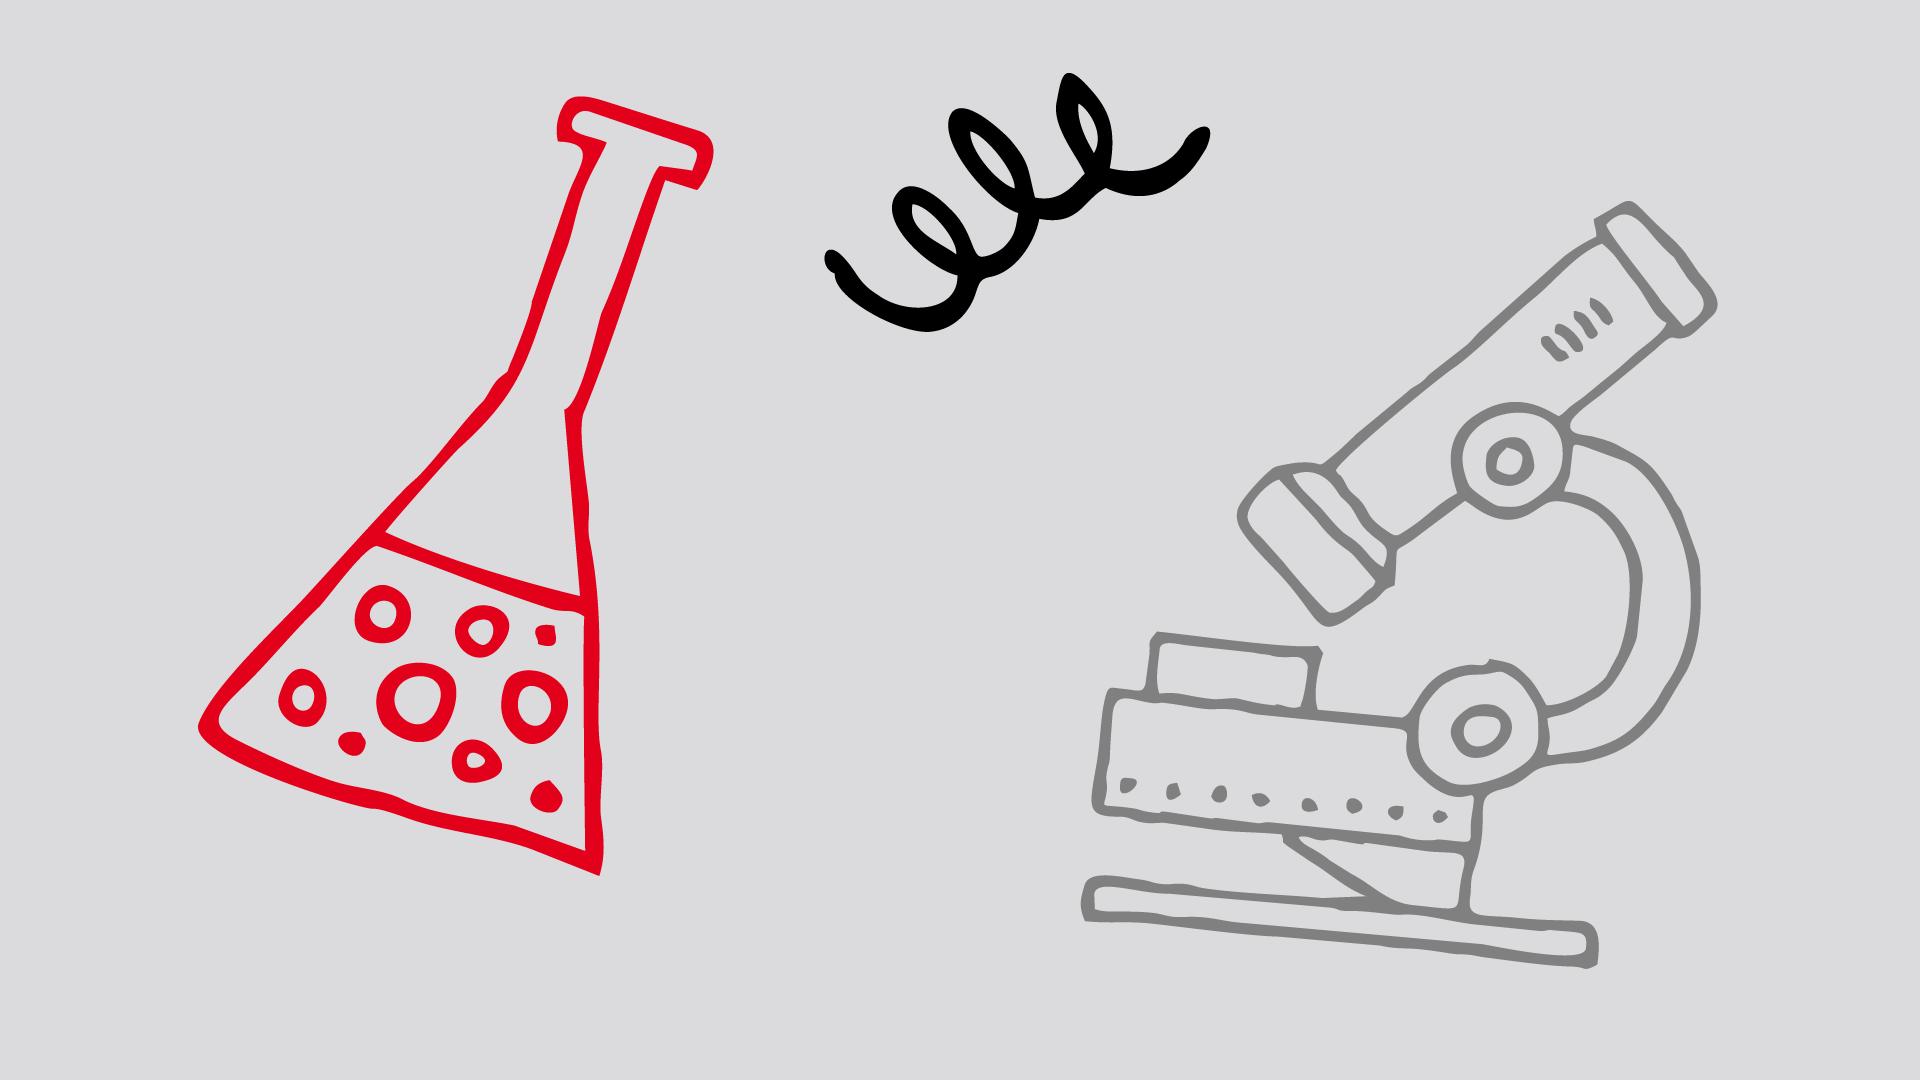 Sciences.